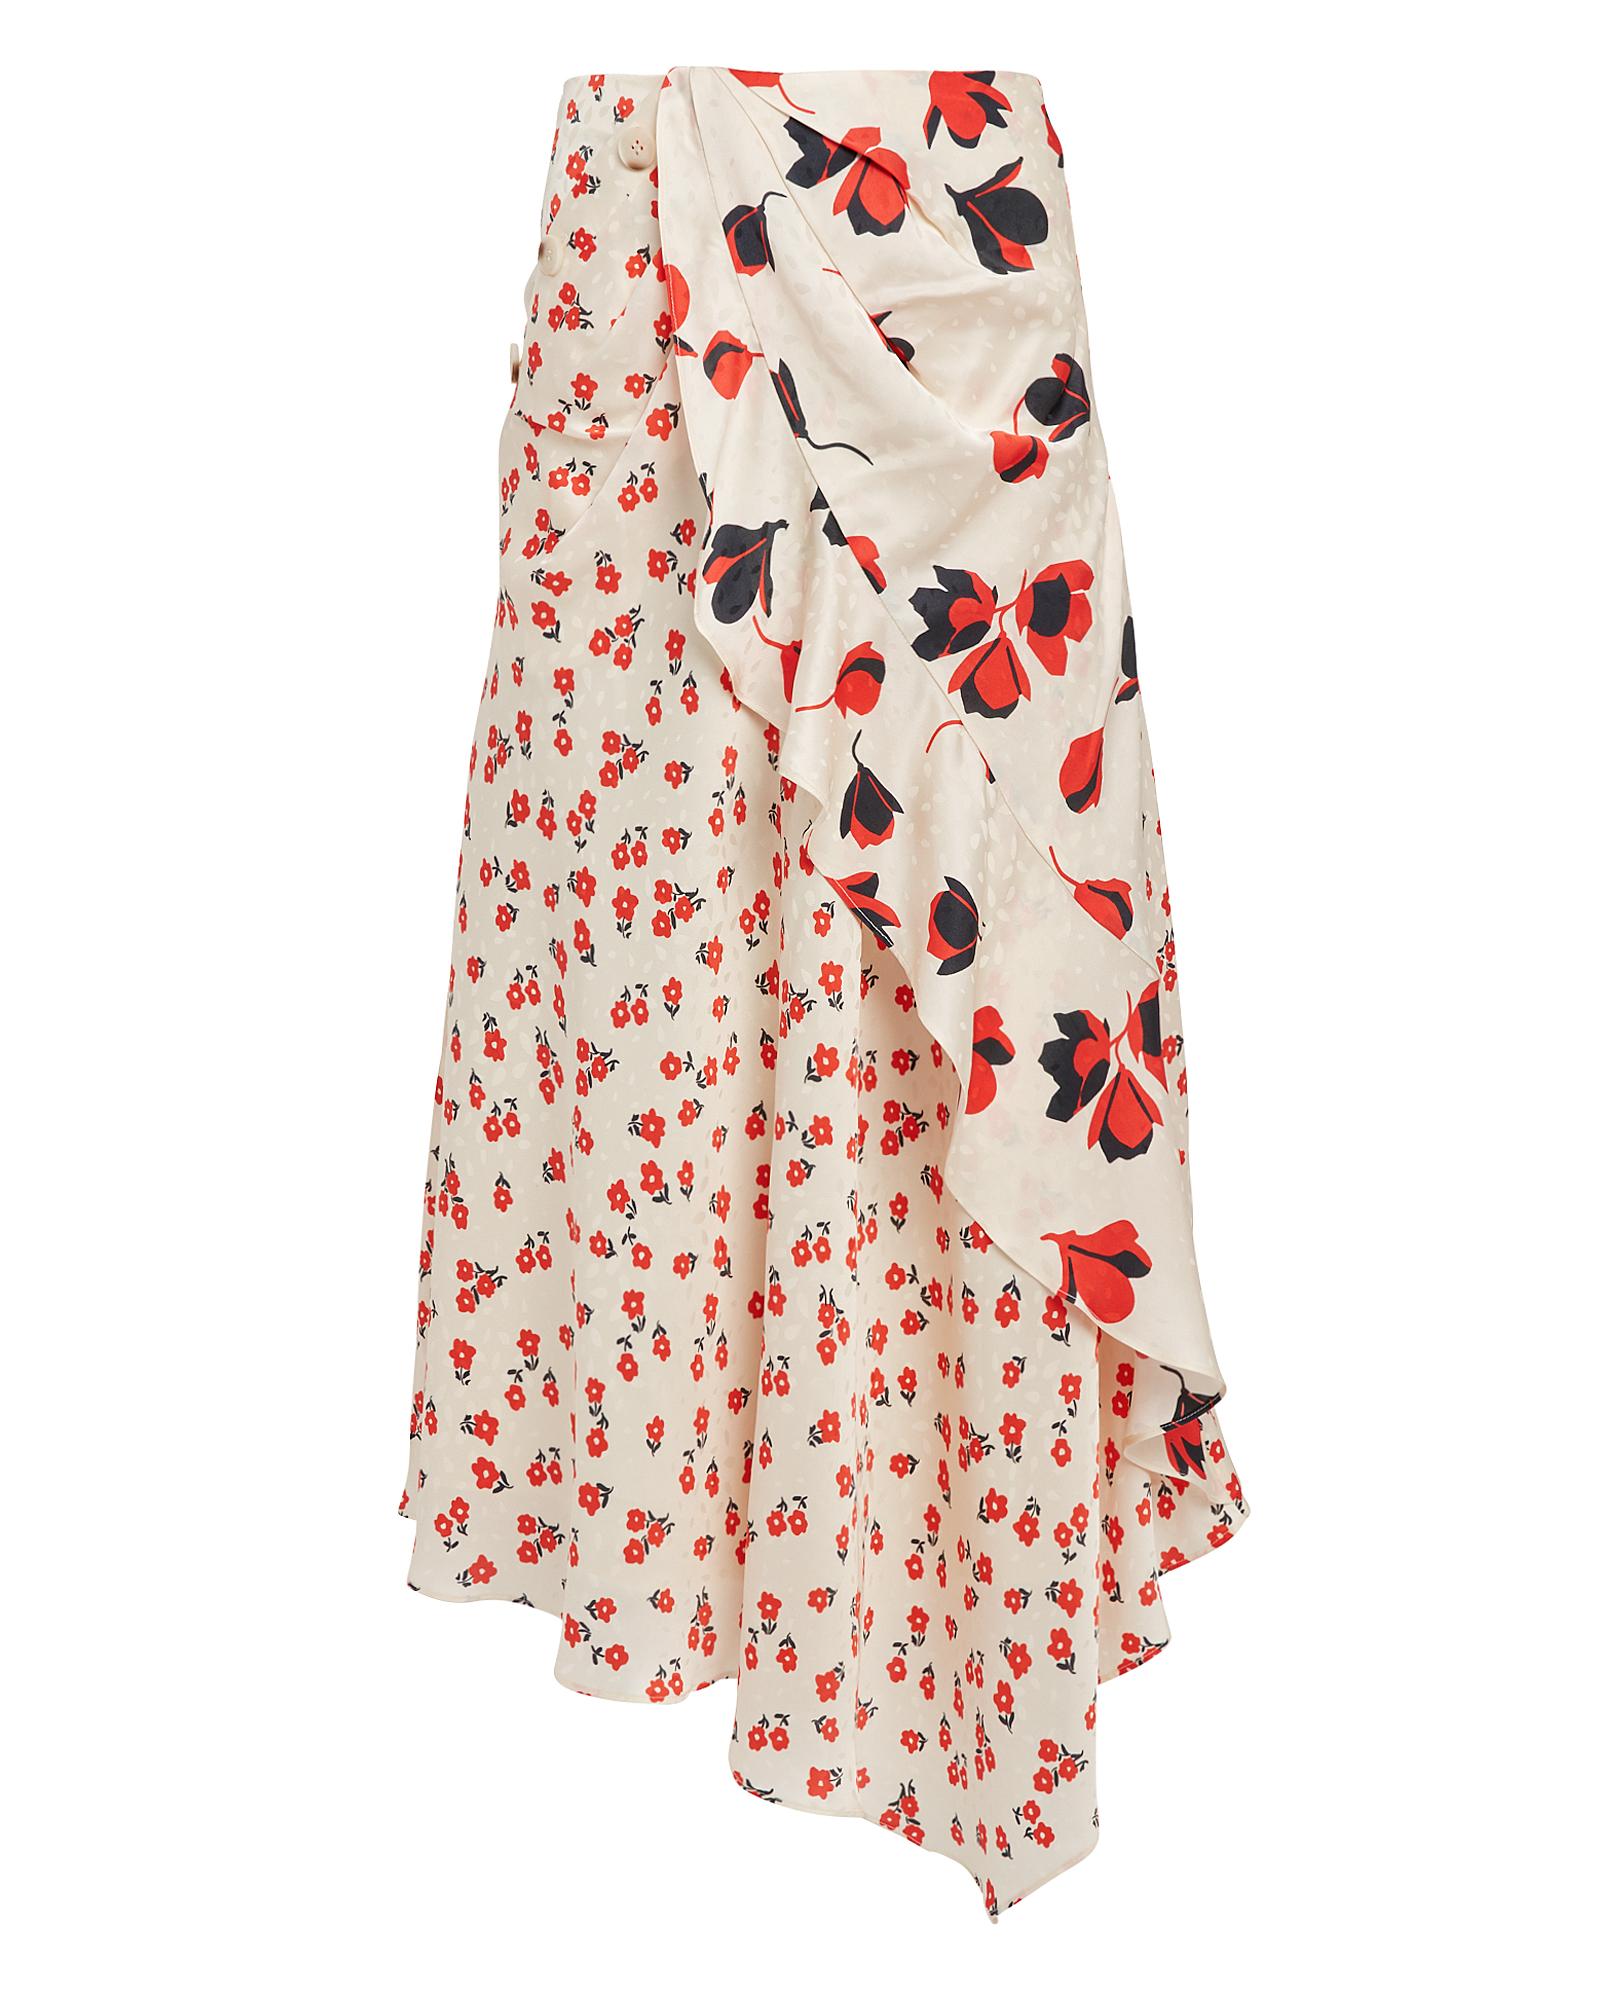 Floral Asymmetric Skirt by Self Portrait